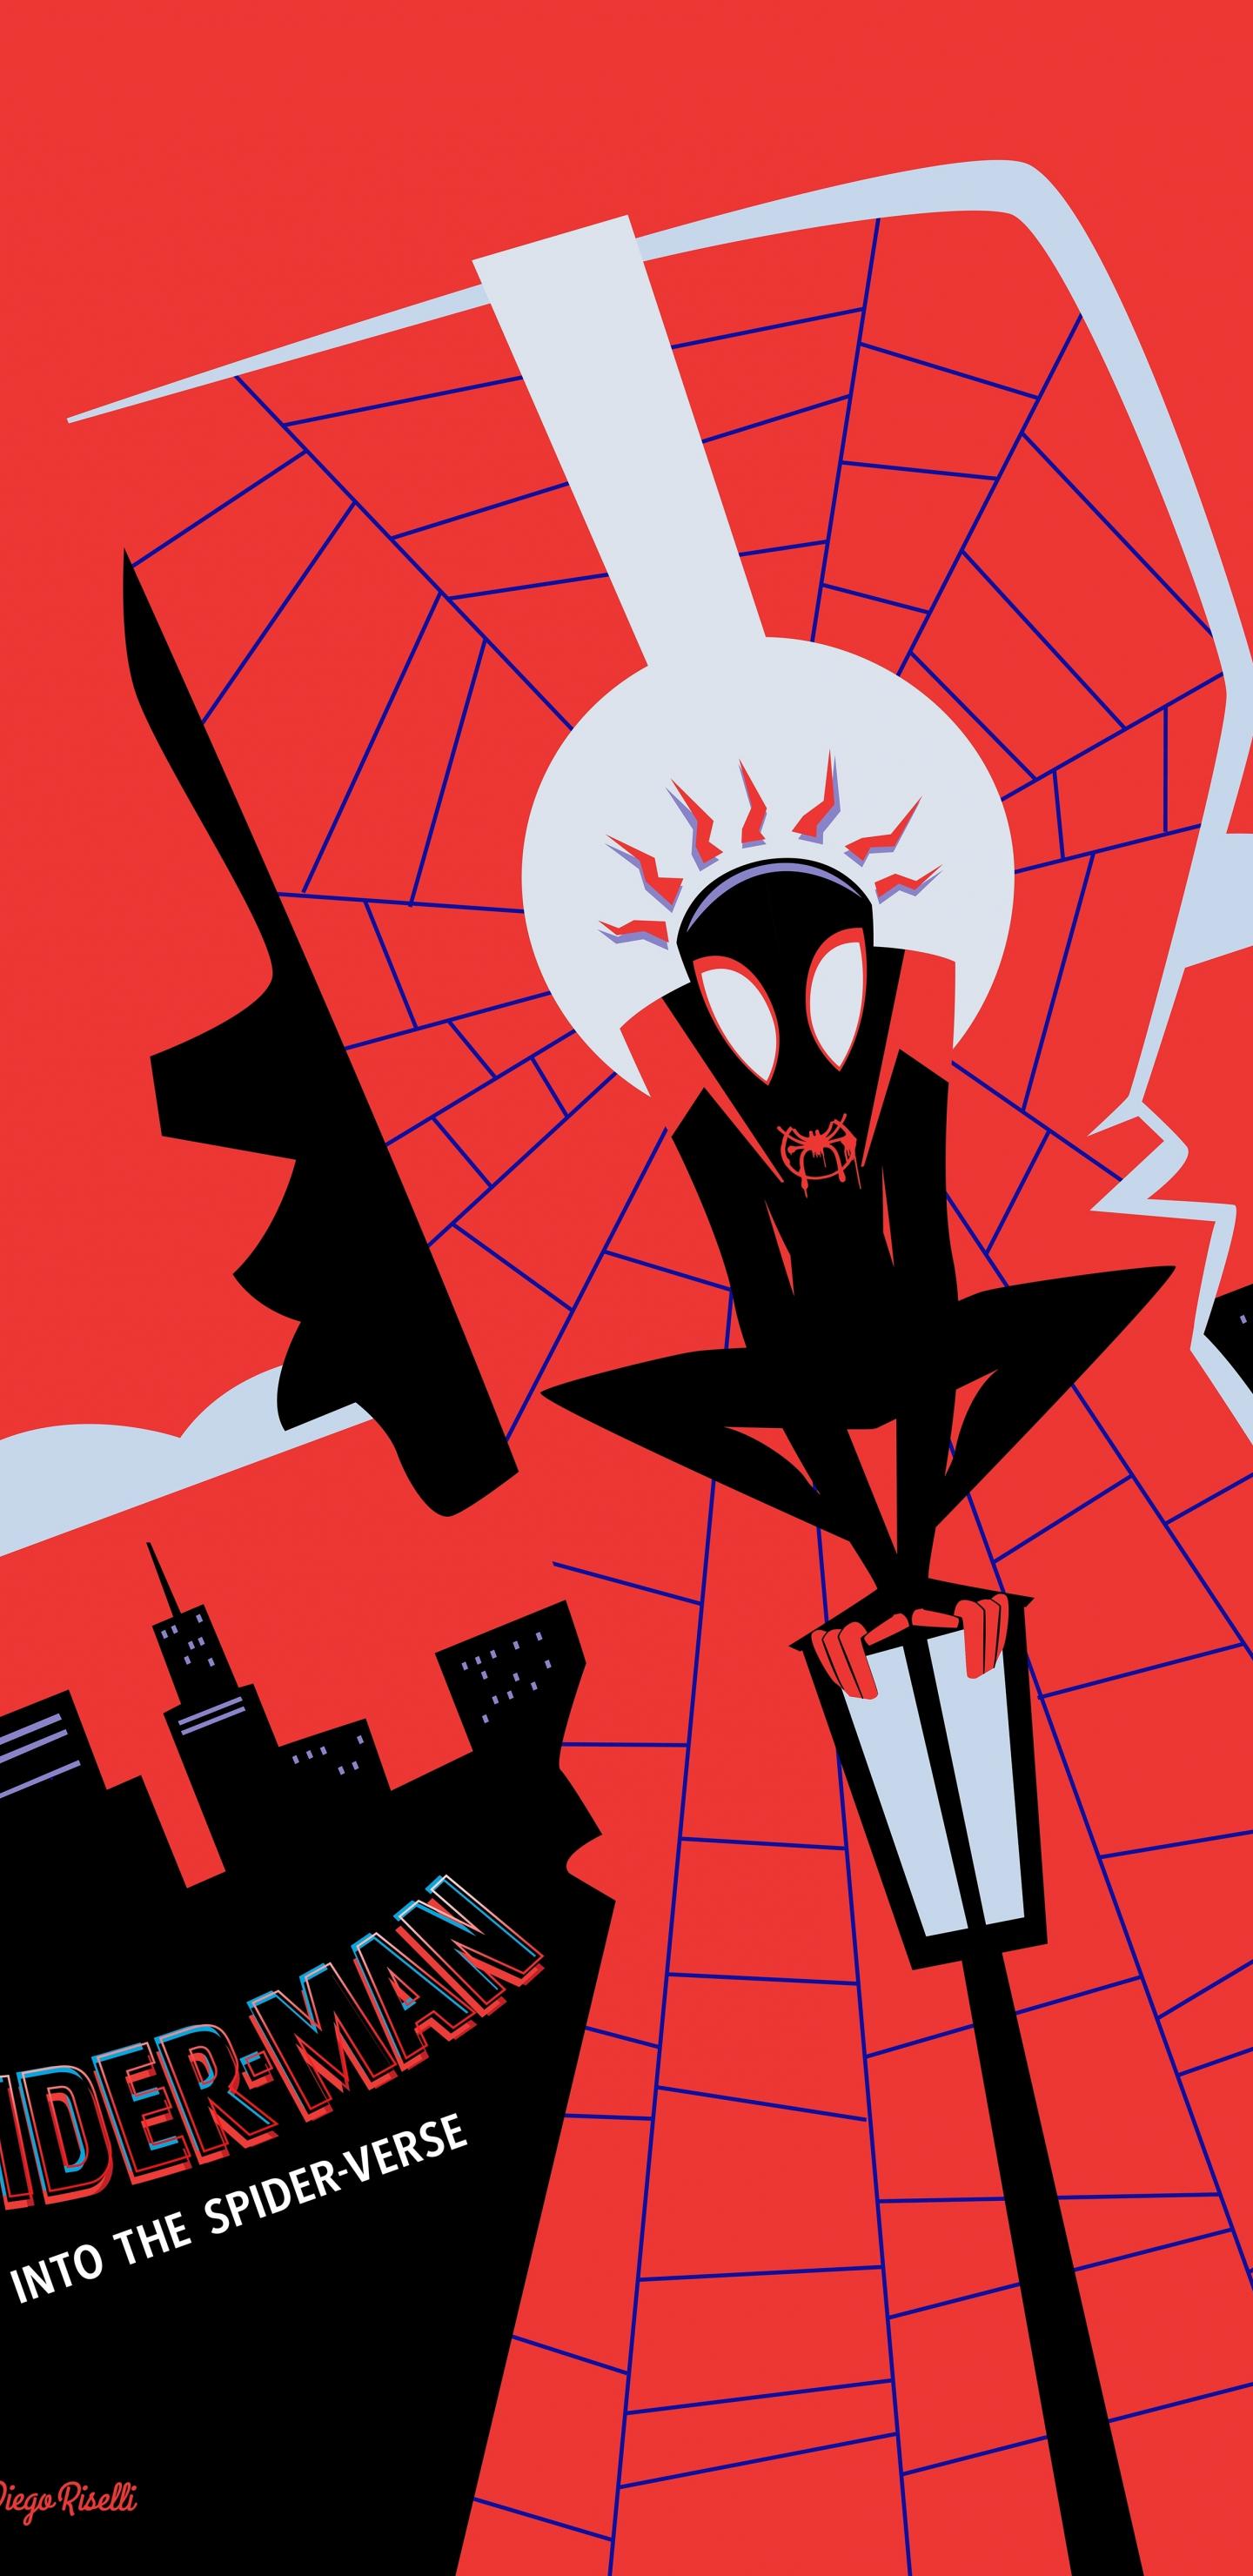 Download 1440x2960 Wallpaper Spider Man Into The Spider Verse